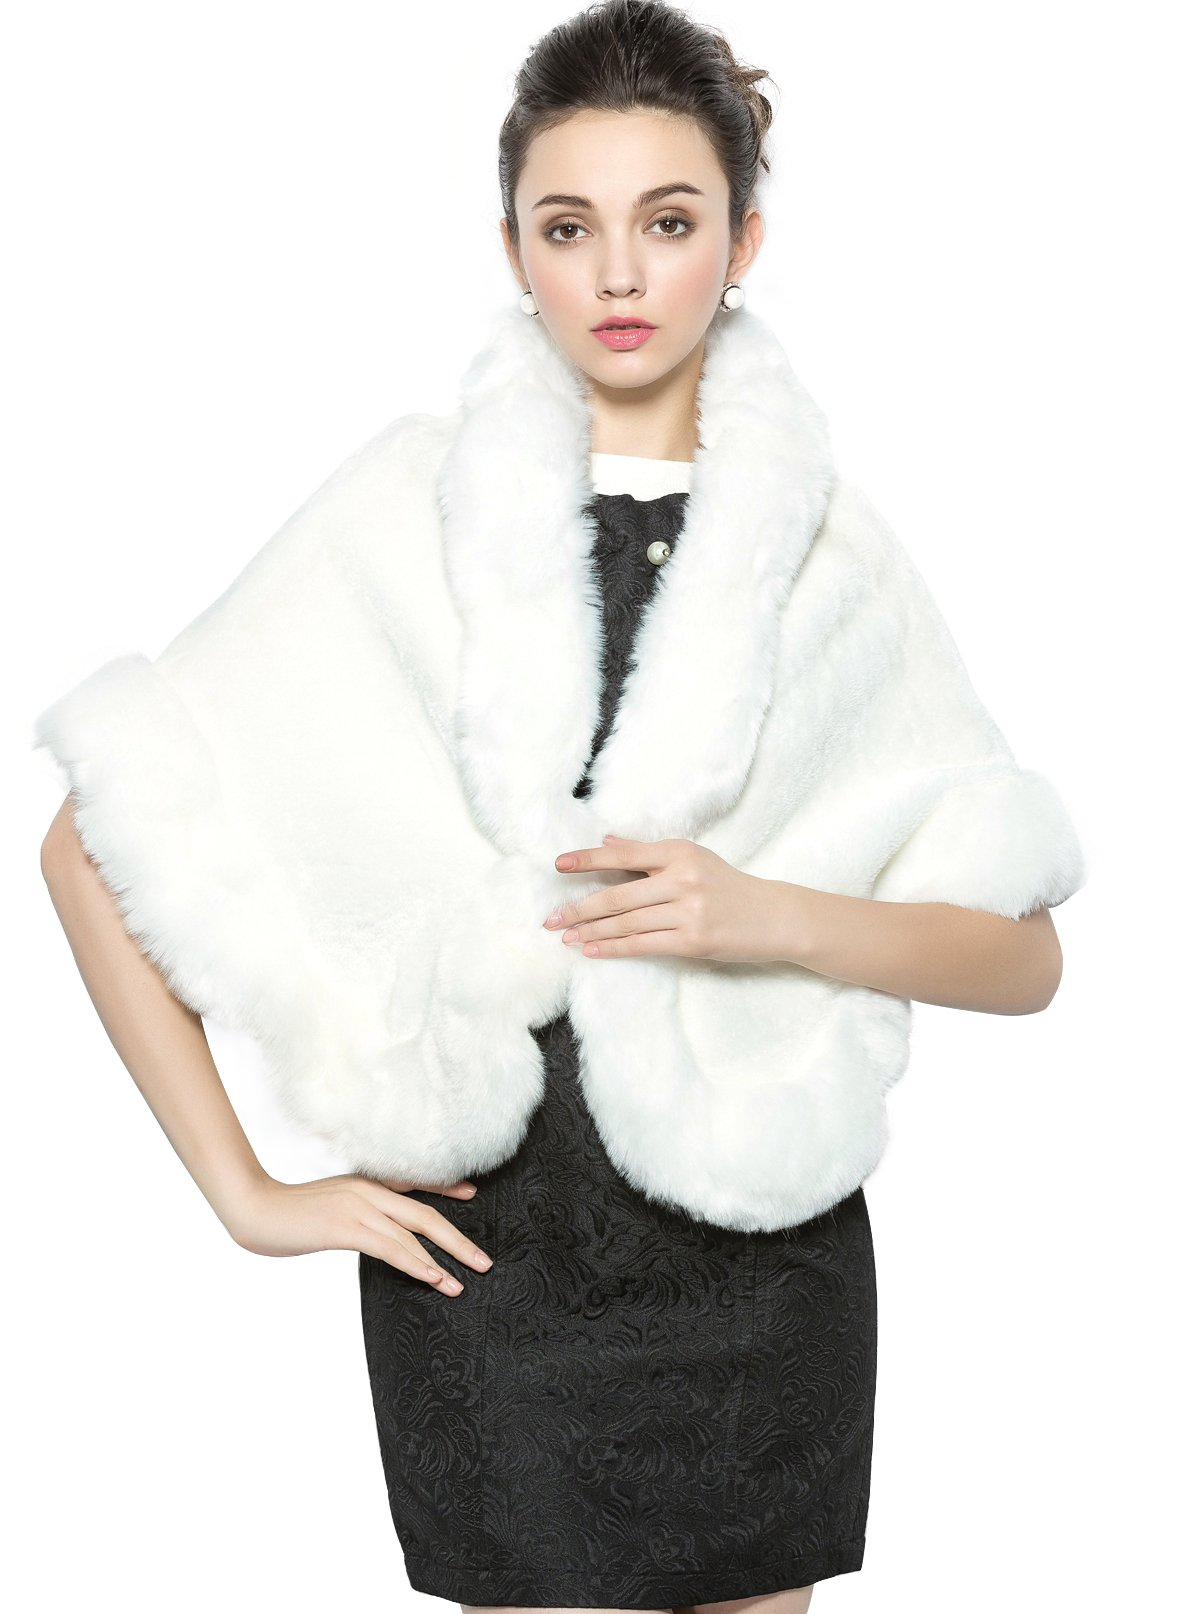 Faux Fur Shawl Cape Wrap Stoles for Wedding Bride Party Dress Ivory